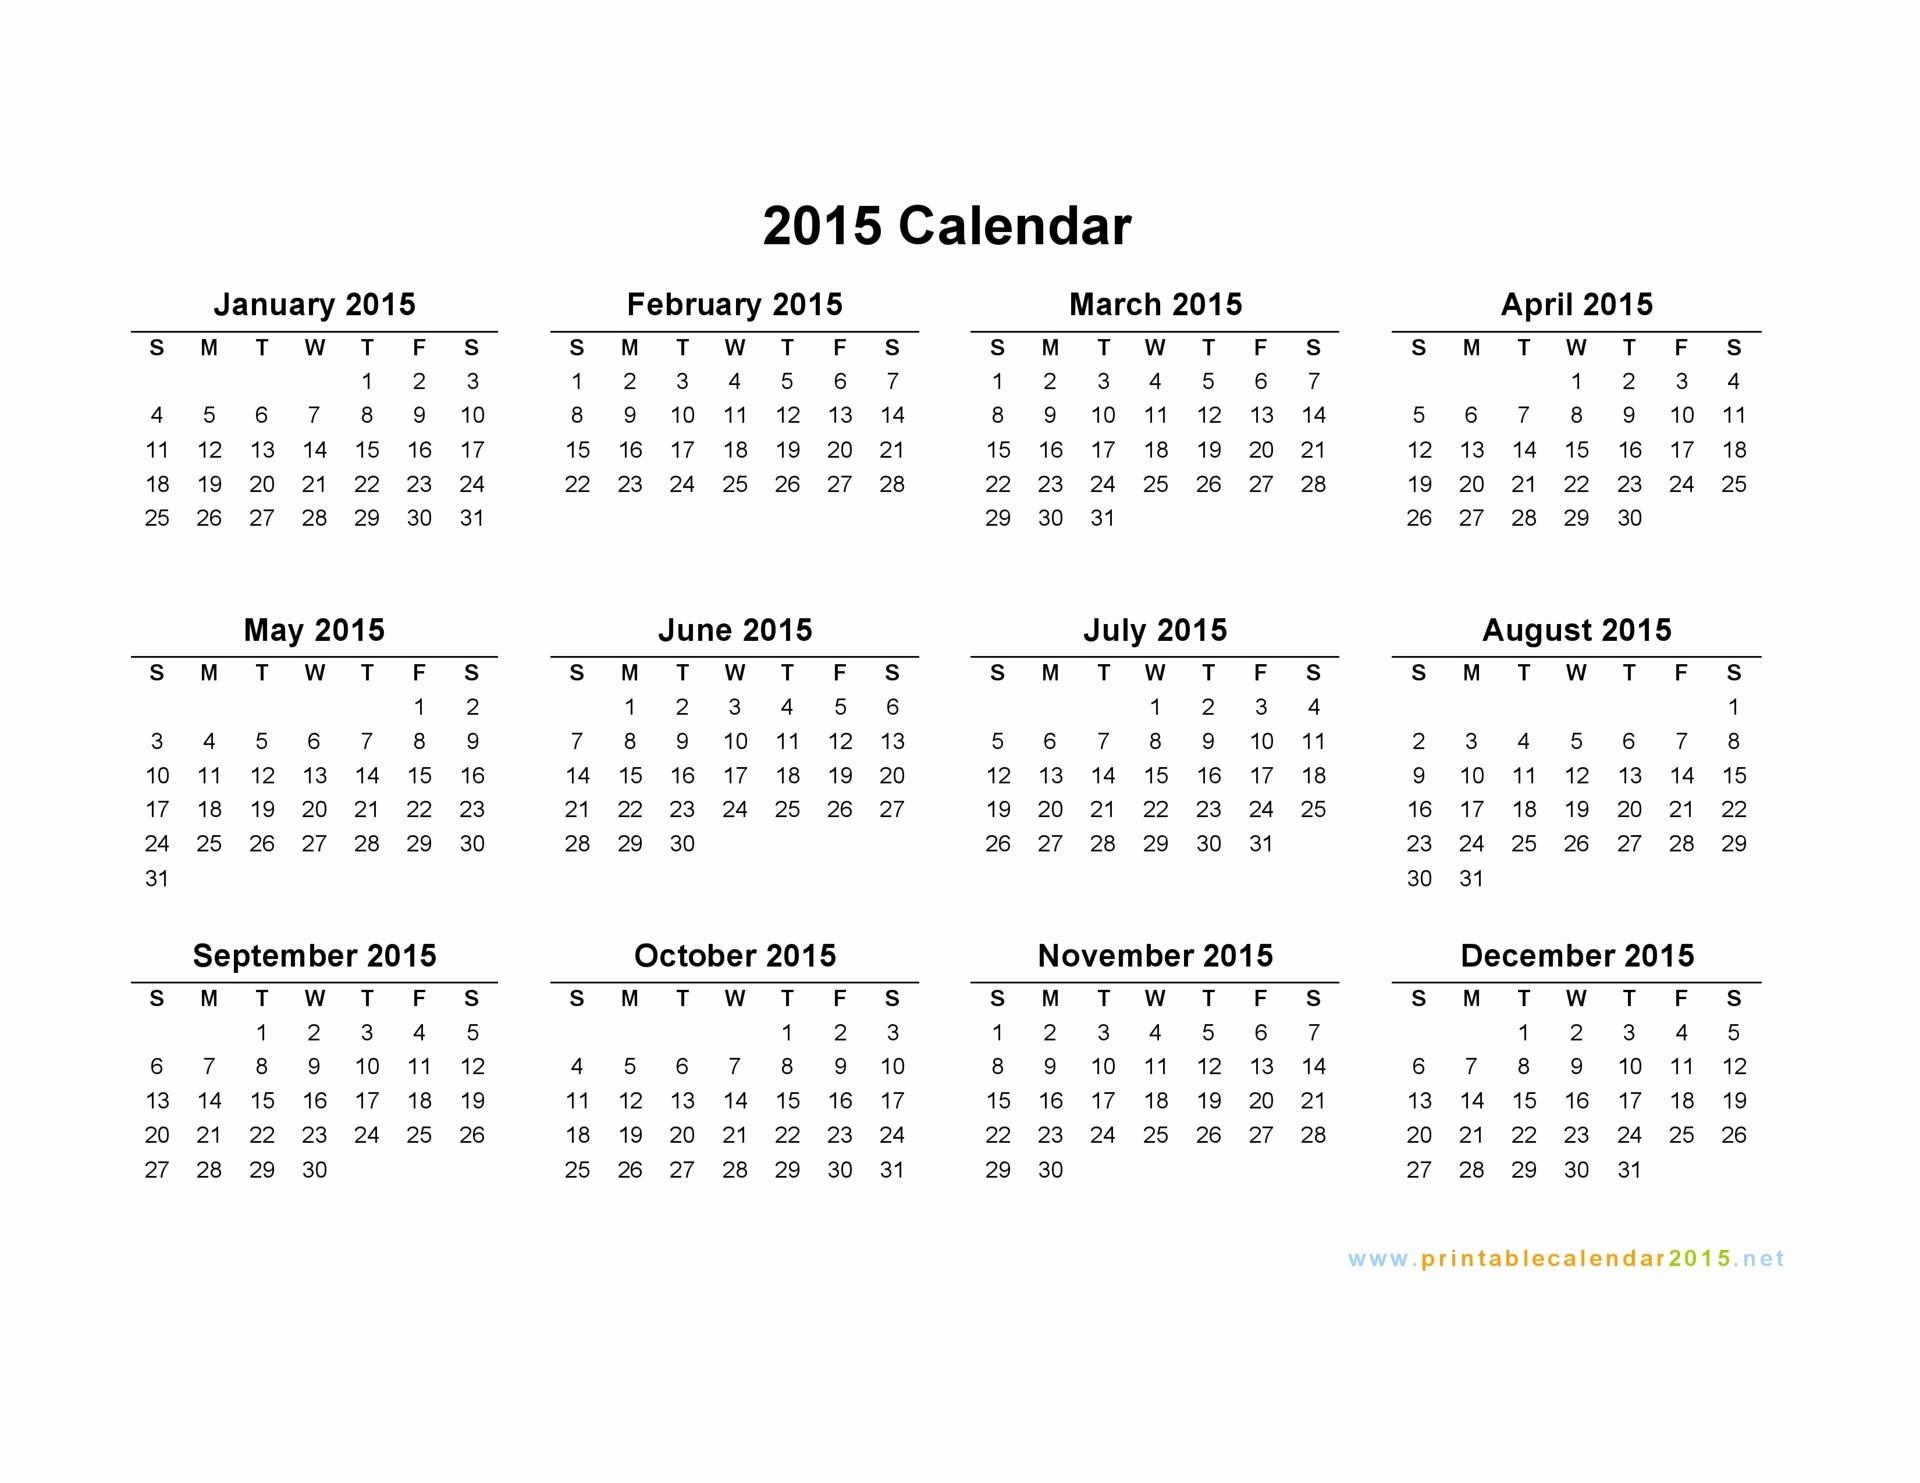 2015 Yearly Calendar Printable Landscape Fresh Printable Yearly Calendar 2015 – 2017 Printable Calendar